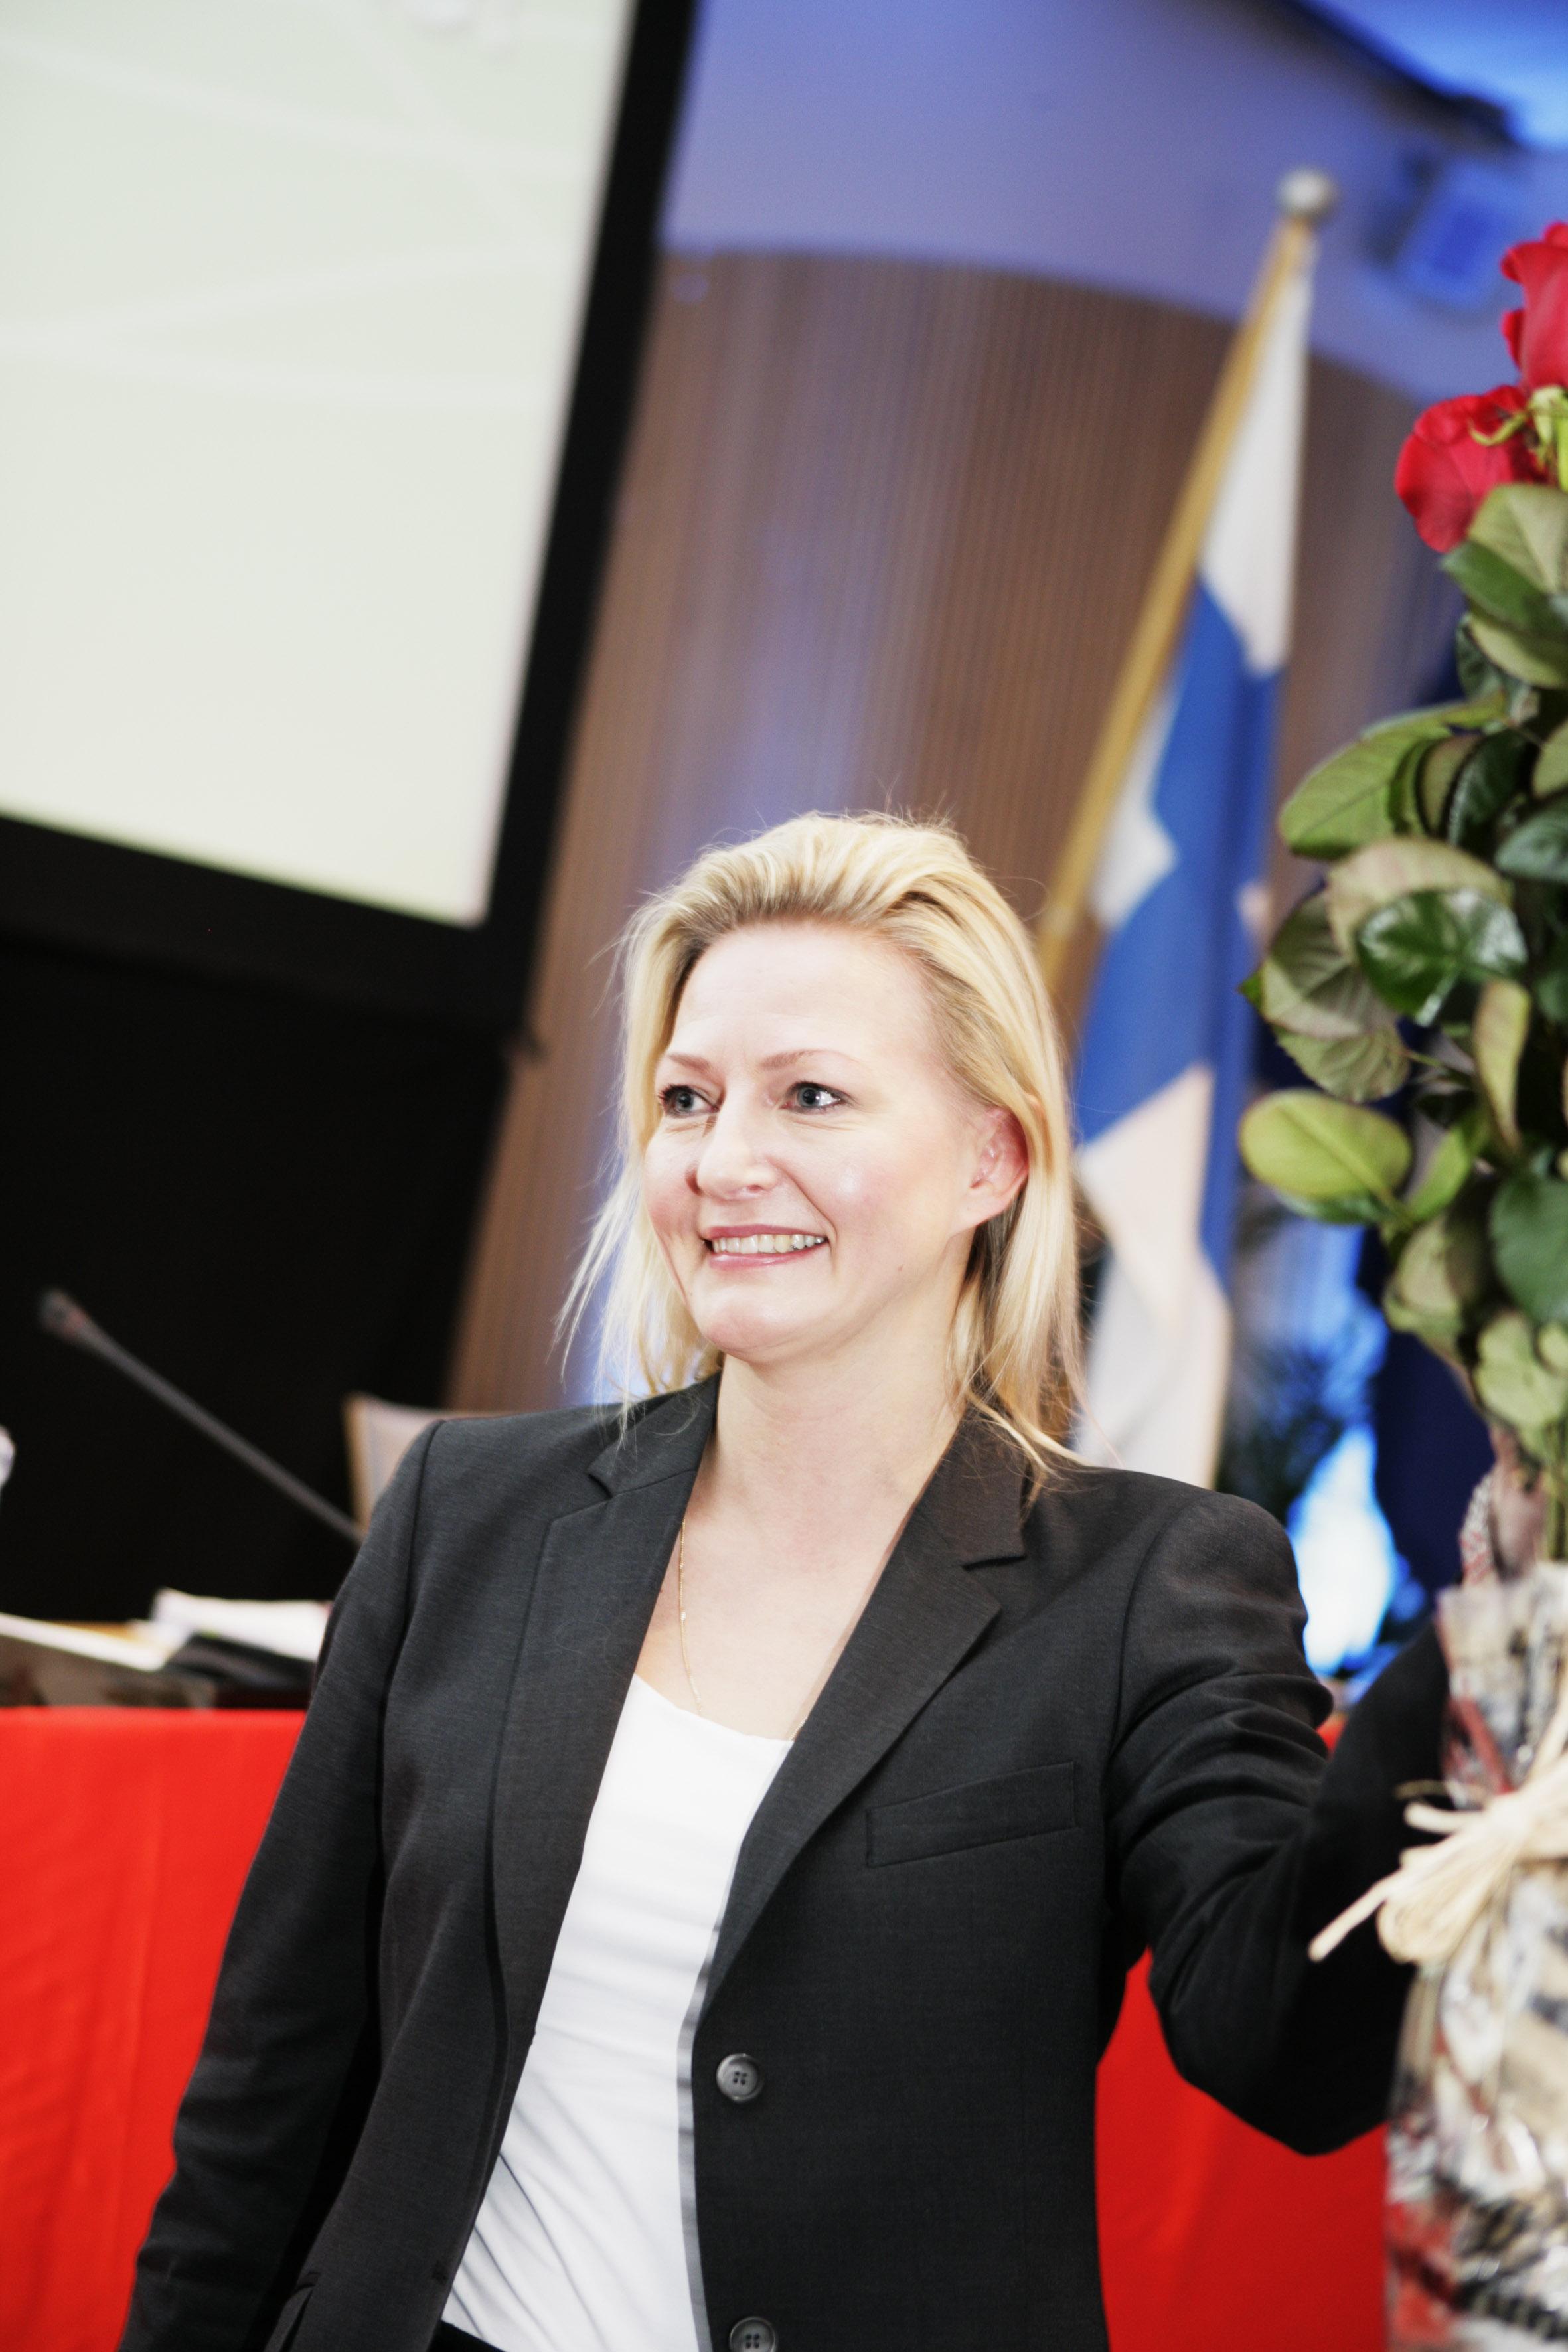 Merja Ailus